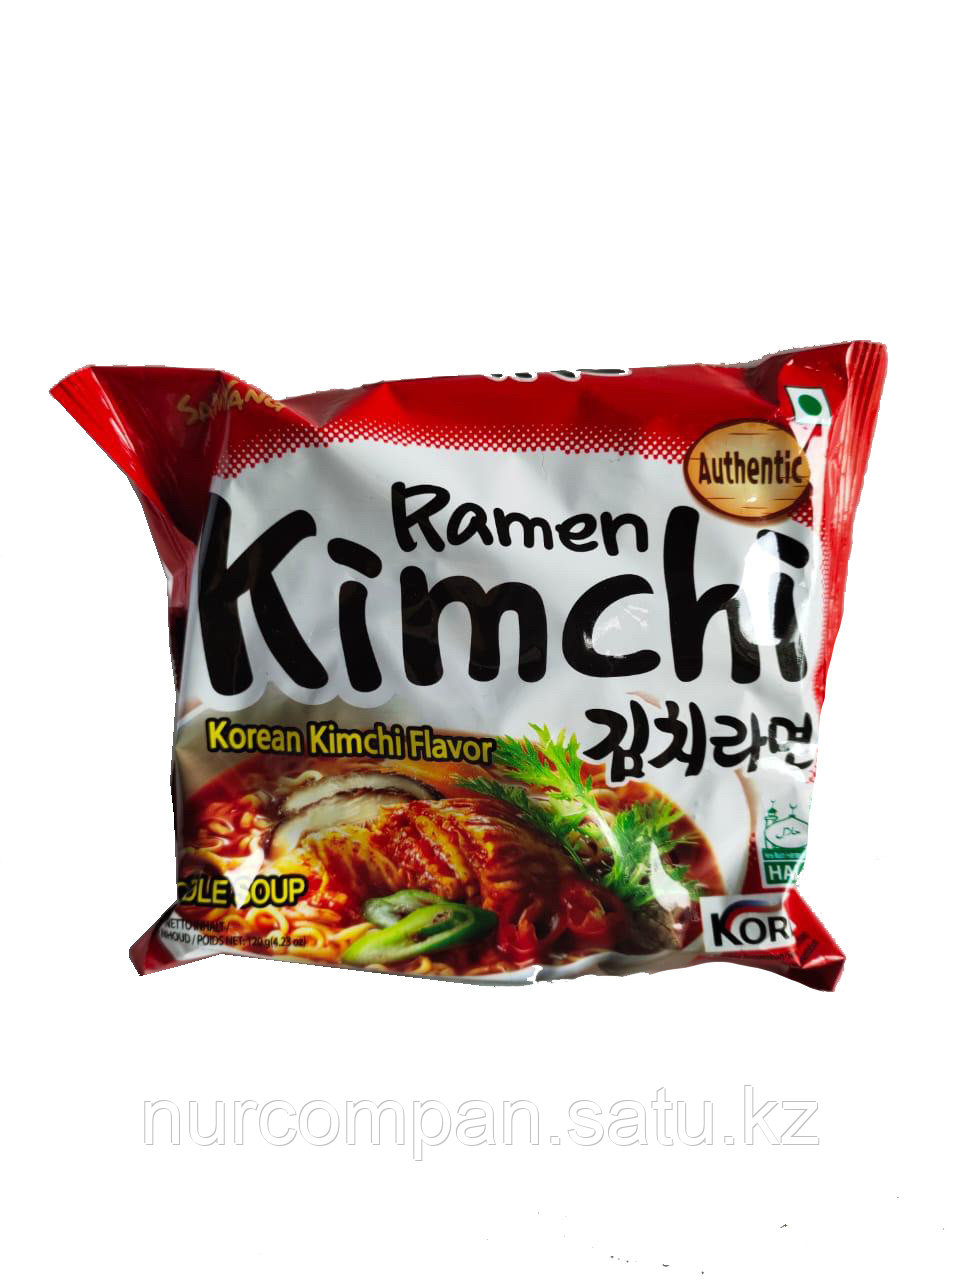 Кимчи рамён